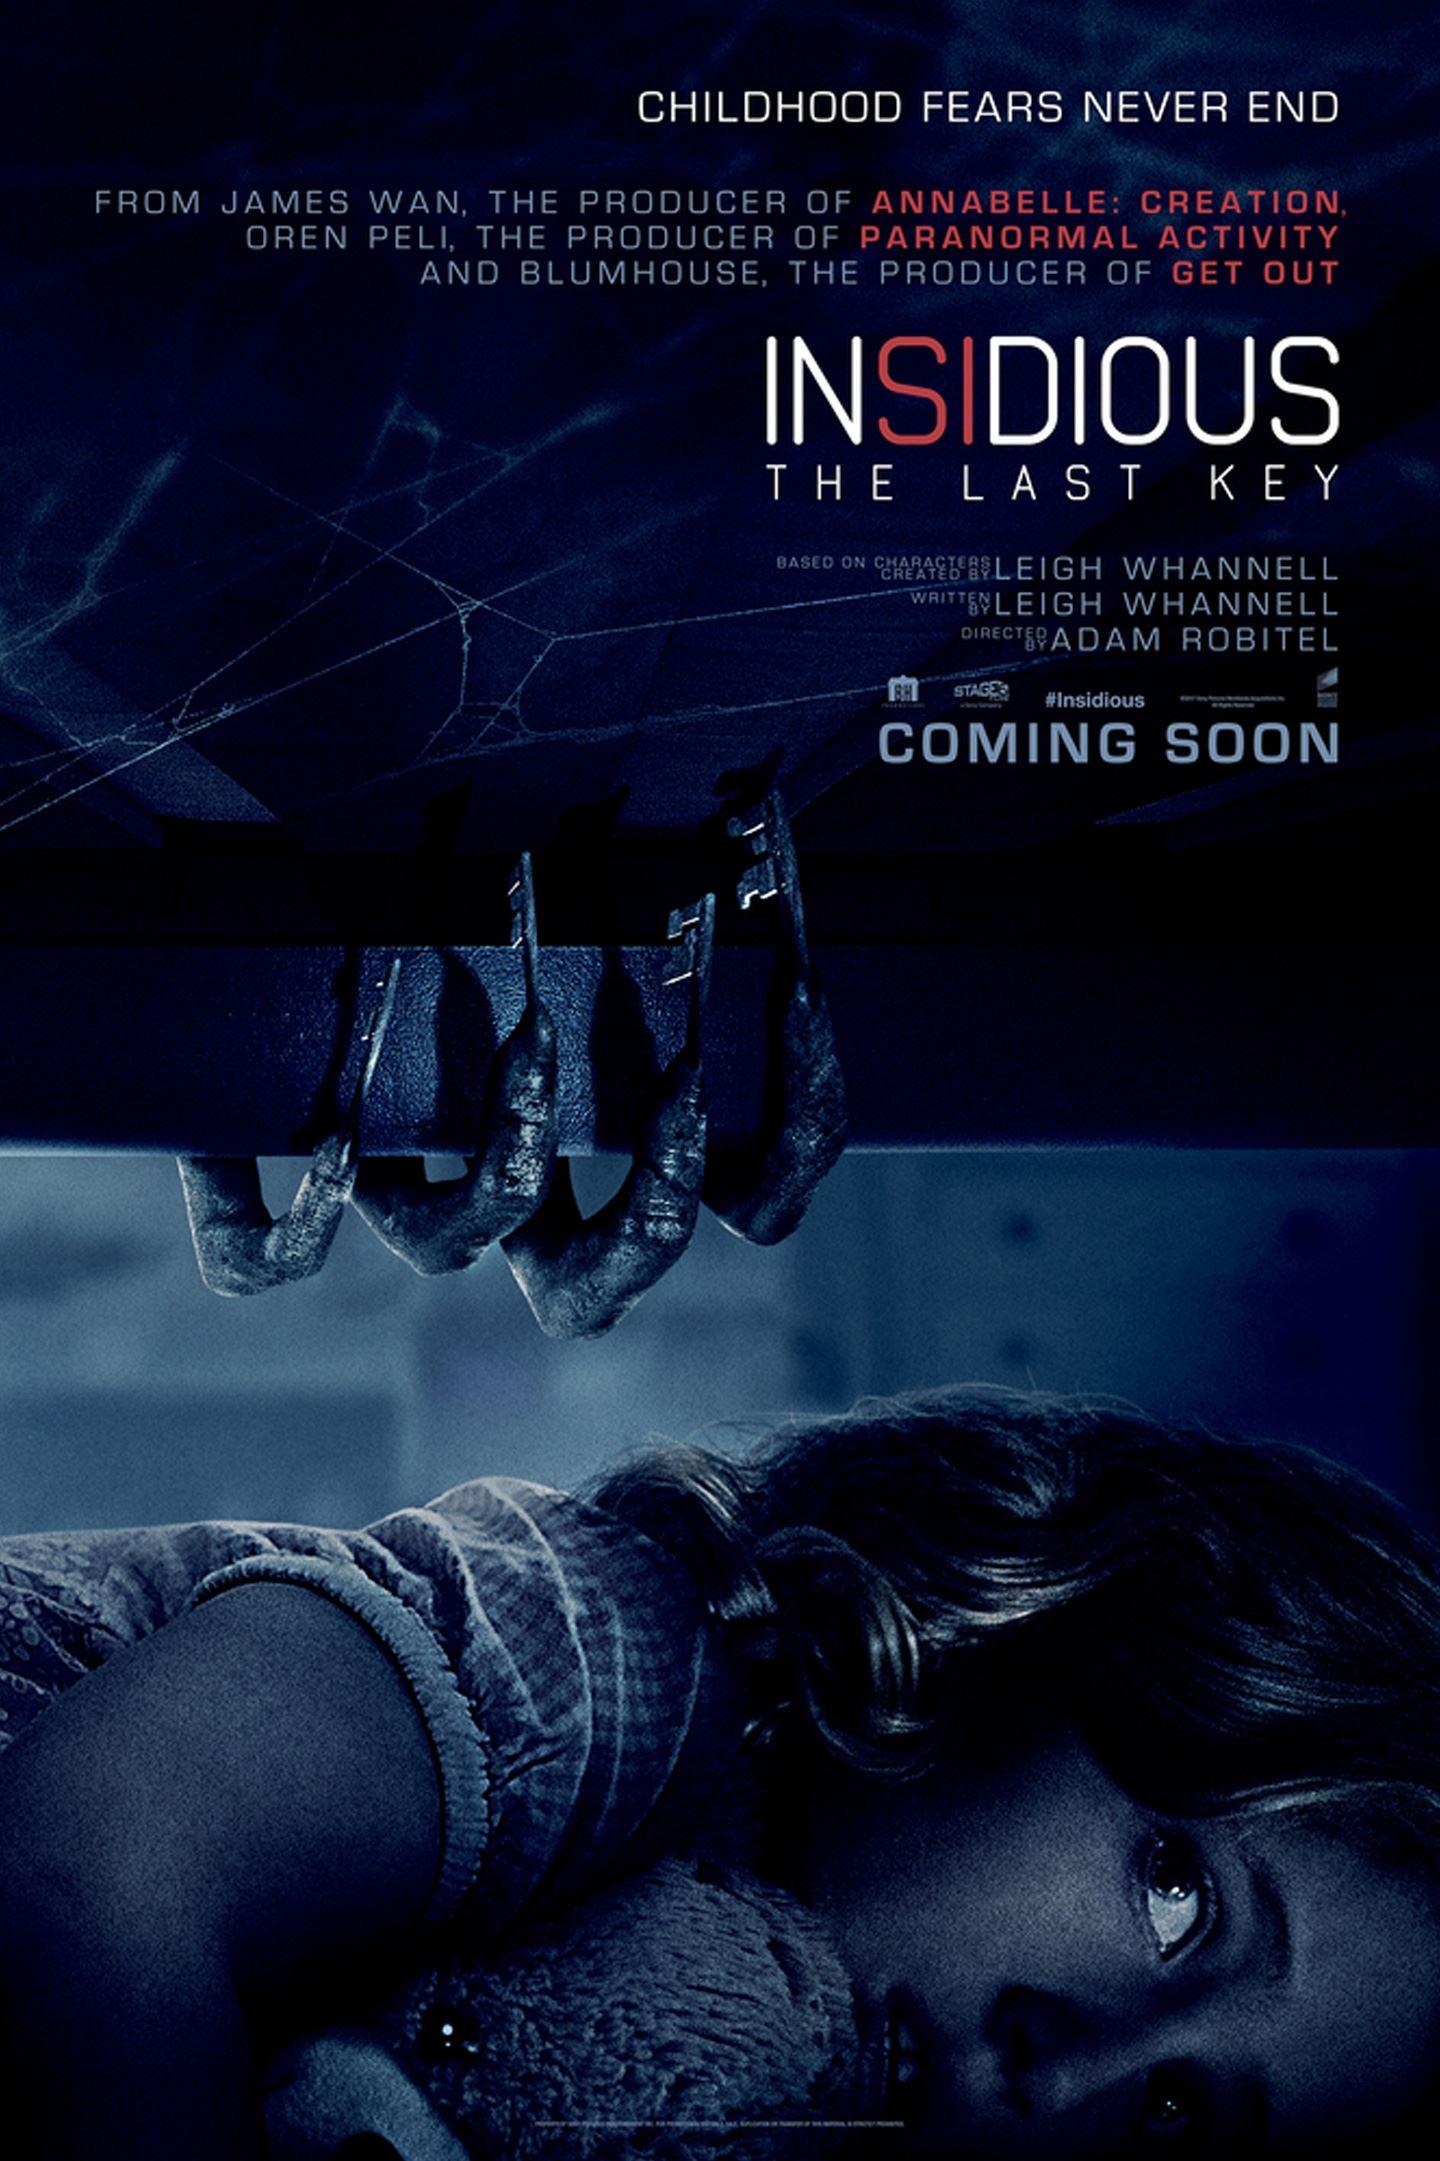 Bio: Insidious: The Last Key